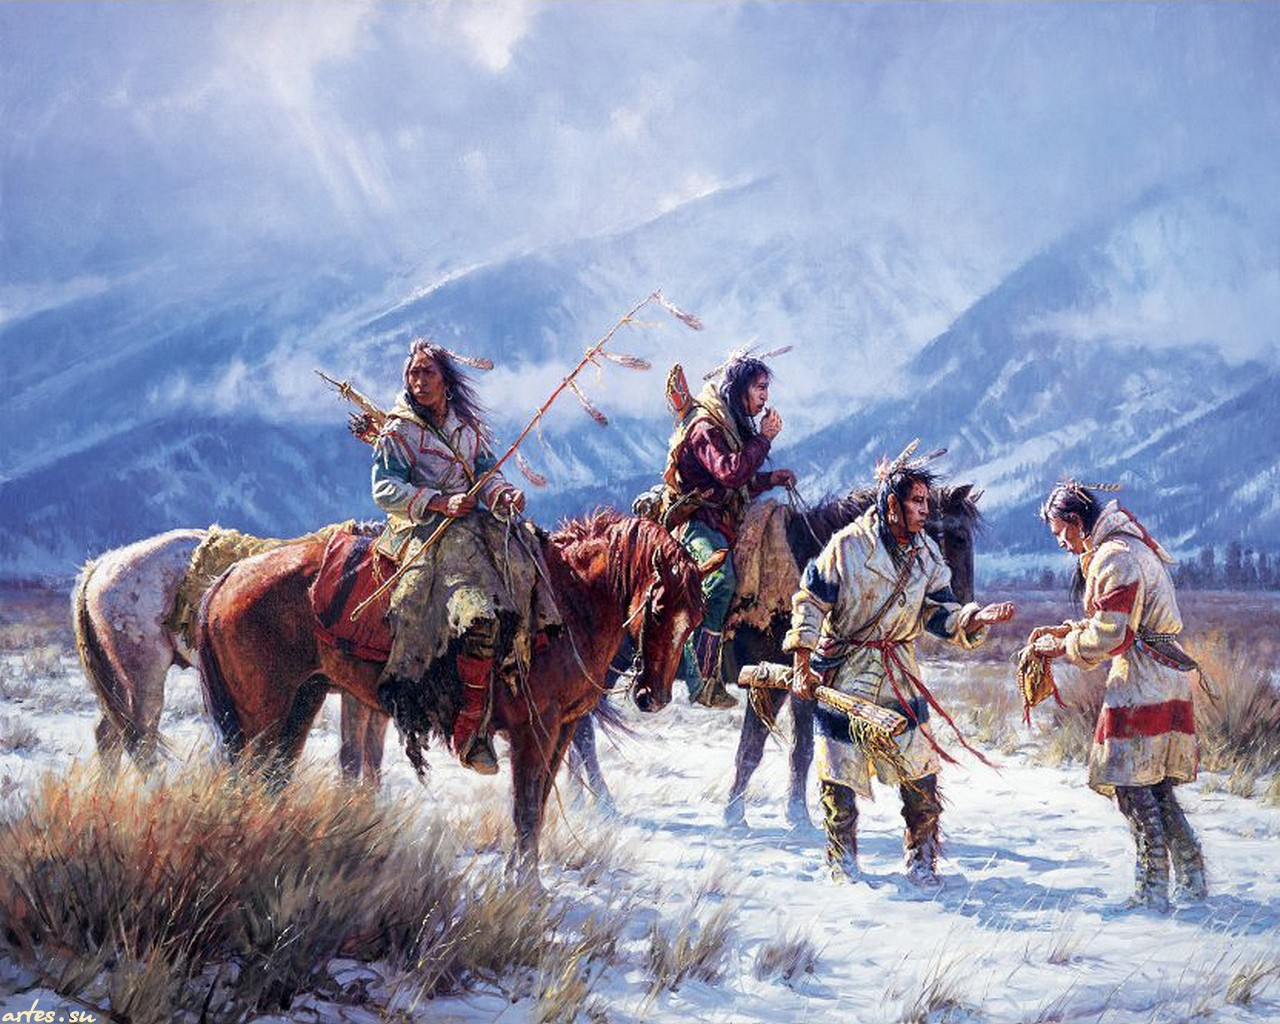 49 Free American Indian Wallpaper Downloads On Wallpapersafari